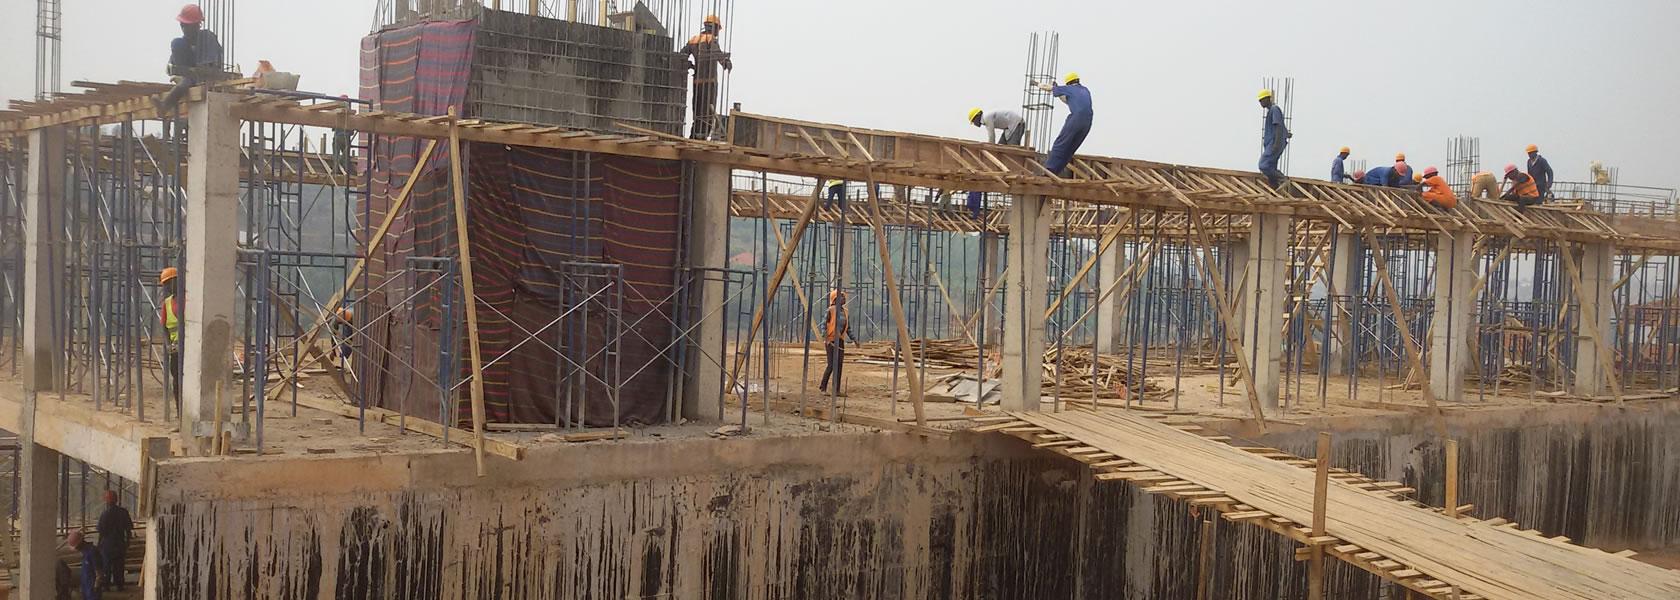 Engineering Power House Ltd